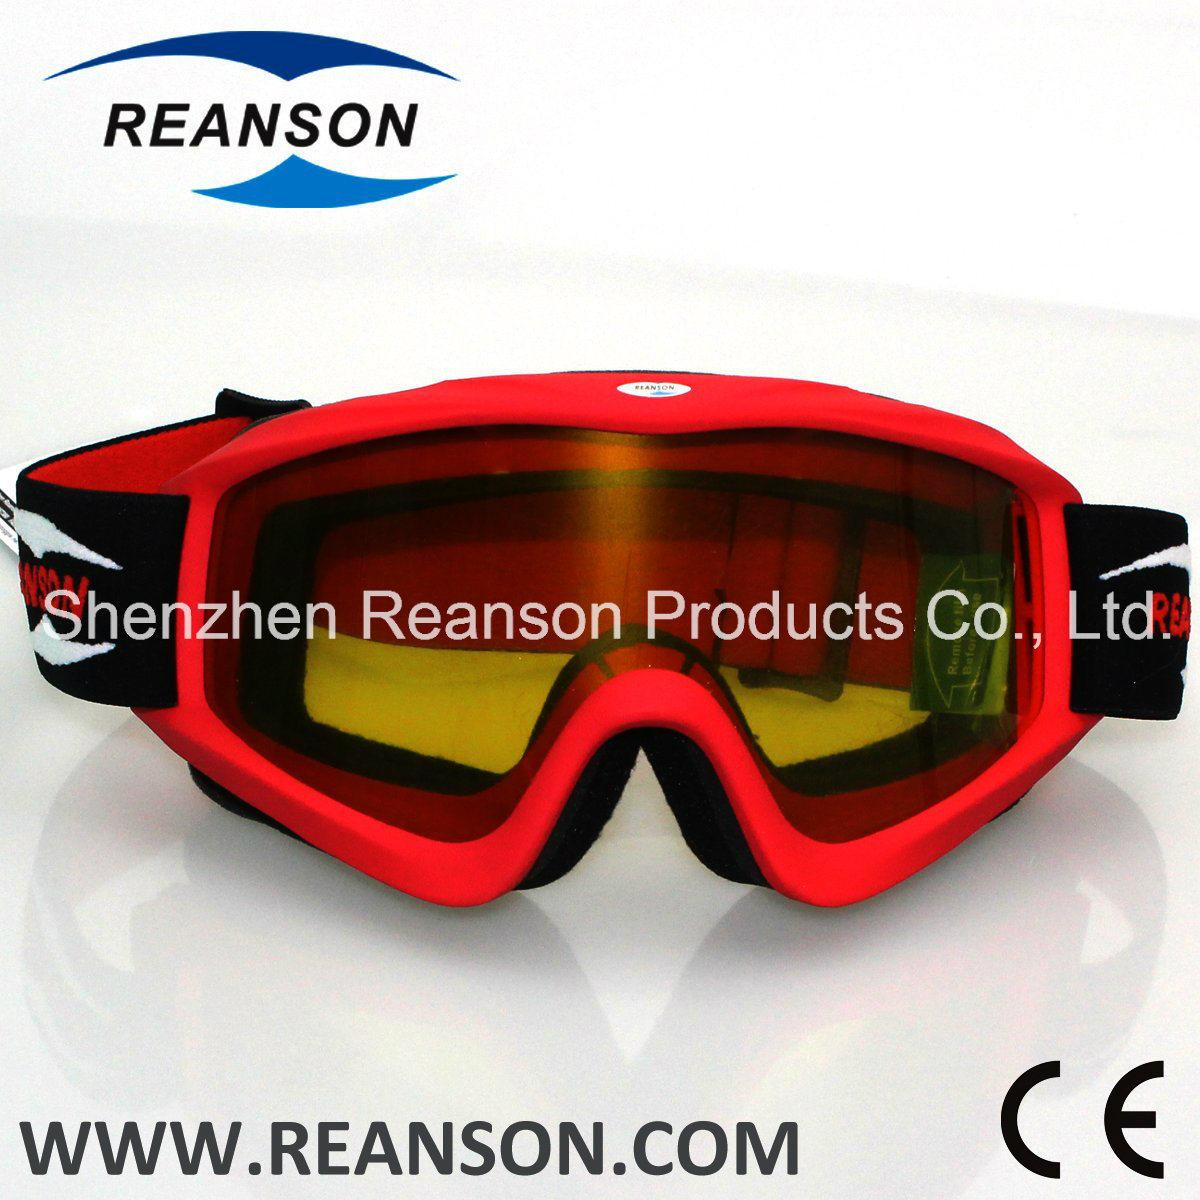 Reanson Professional Anti-Fog Anti-Scratch Motocross Goggle